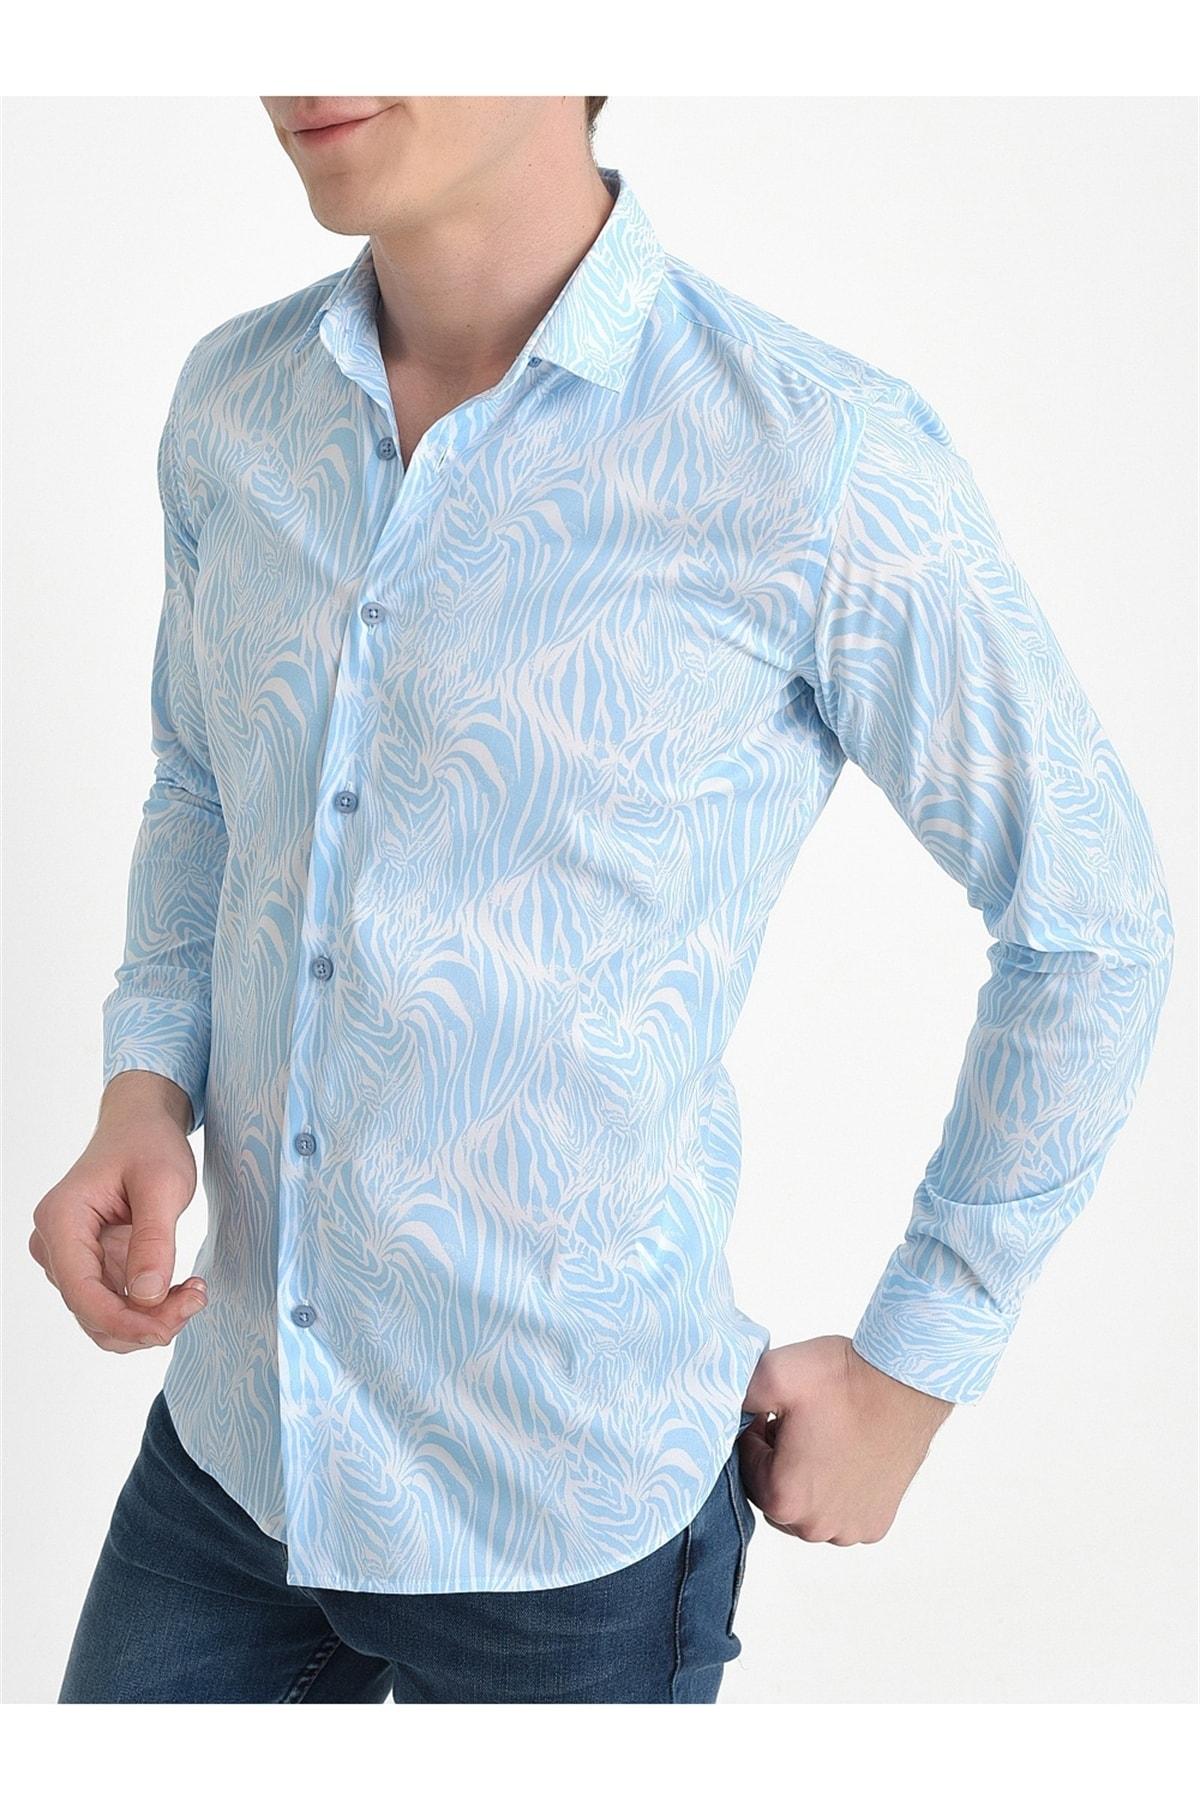 Efor G 1407 Slim Fit Mavi Spor Gömlek 2